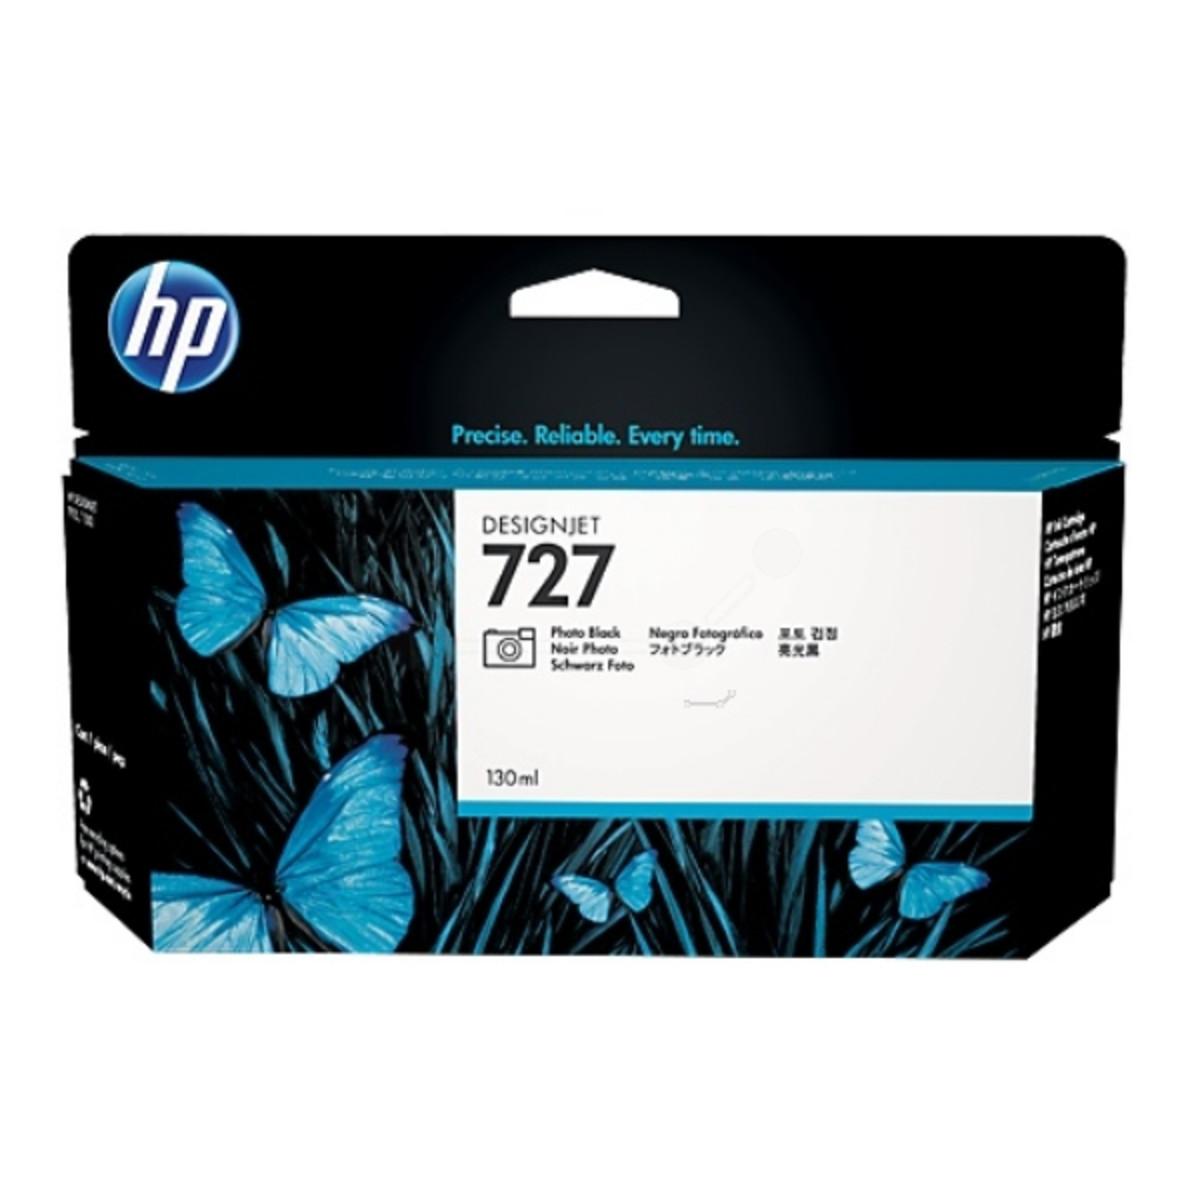 HP 727 (B3P23A) Photo Black Ink Cartridge - 130ml